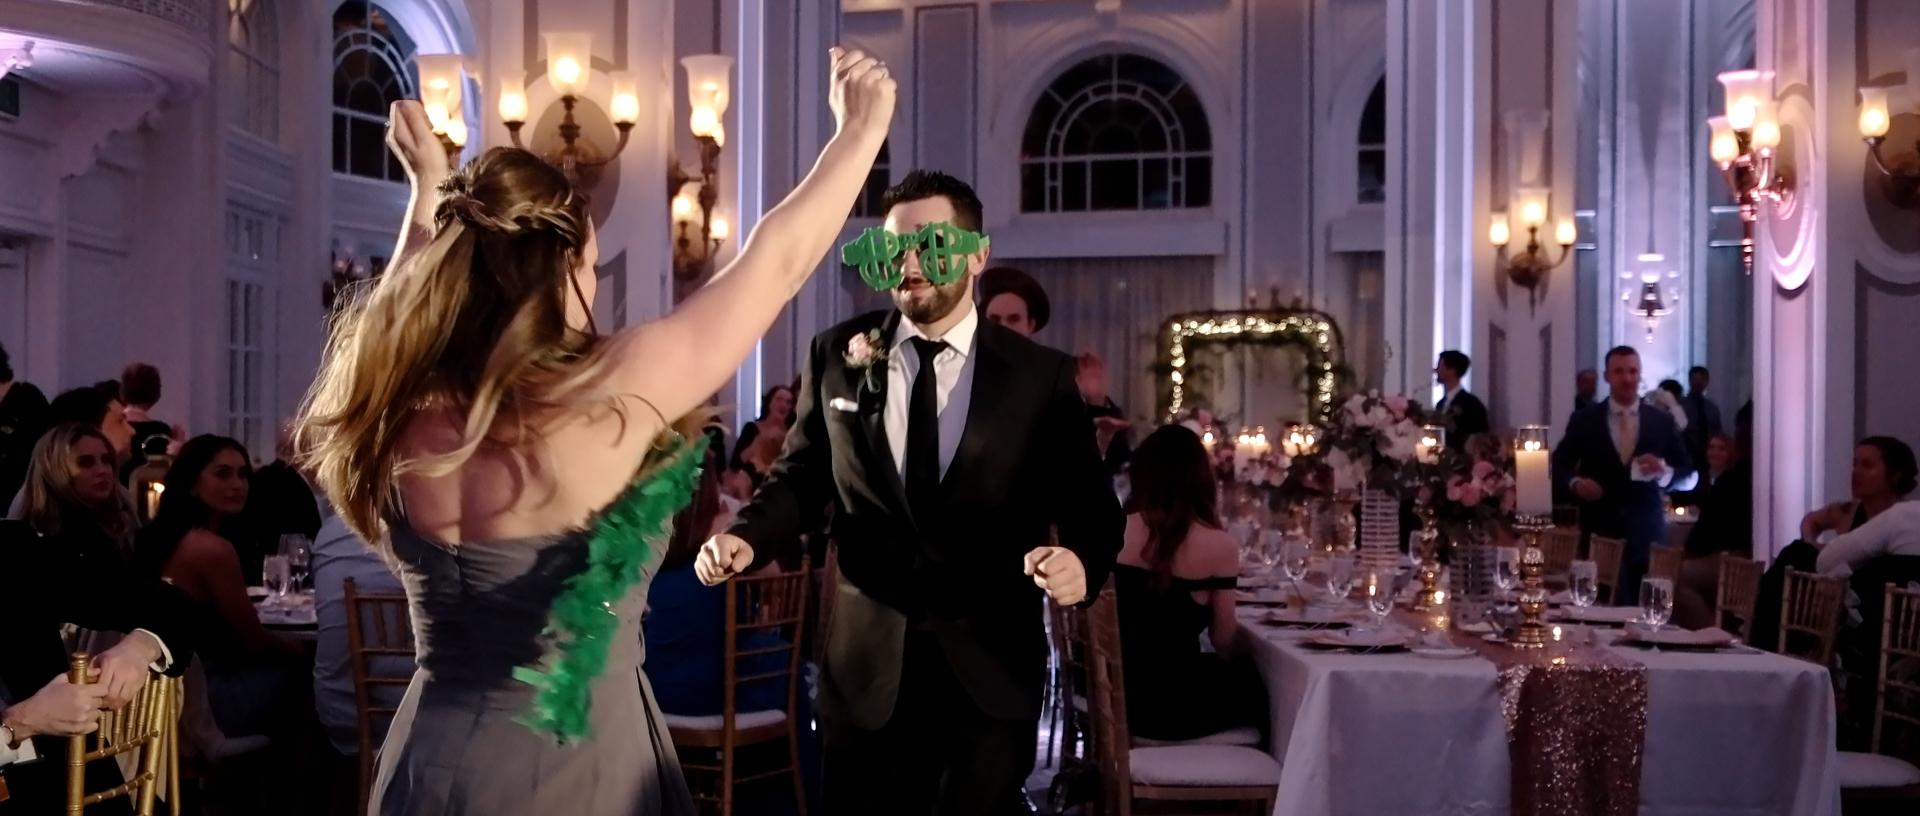 Atlanta Wedding Videographer0021.jpg